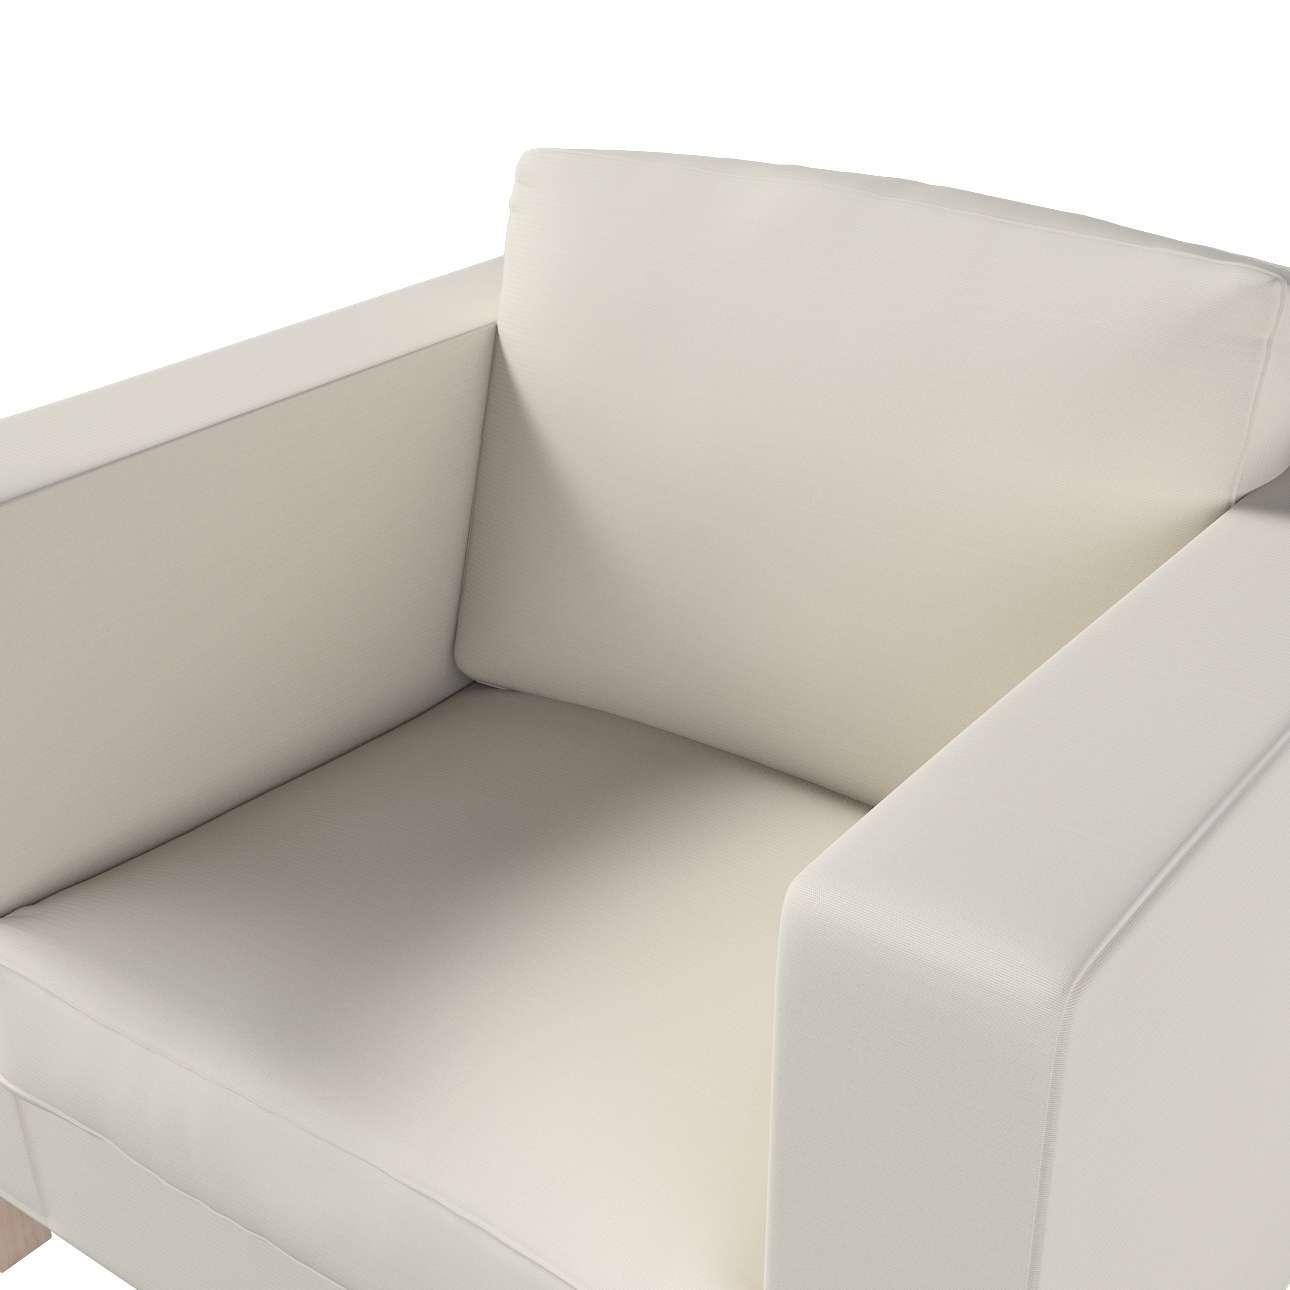 Karlanda fotelhuzat rövid a kollekcióból Cotton Panama Bútorszövet, Dekoranyag: 702-31